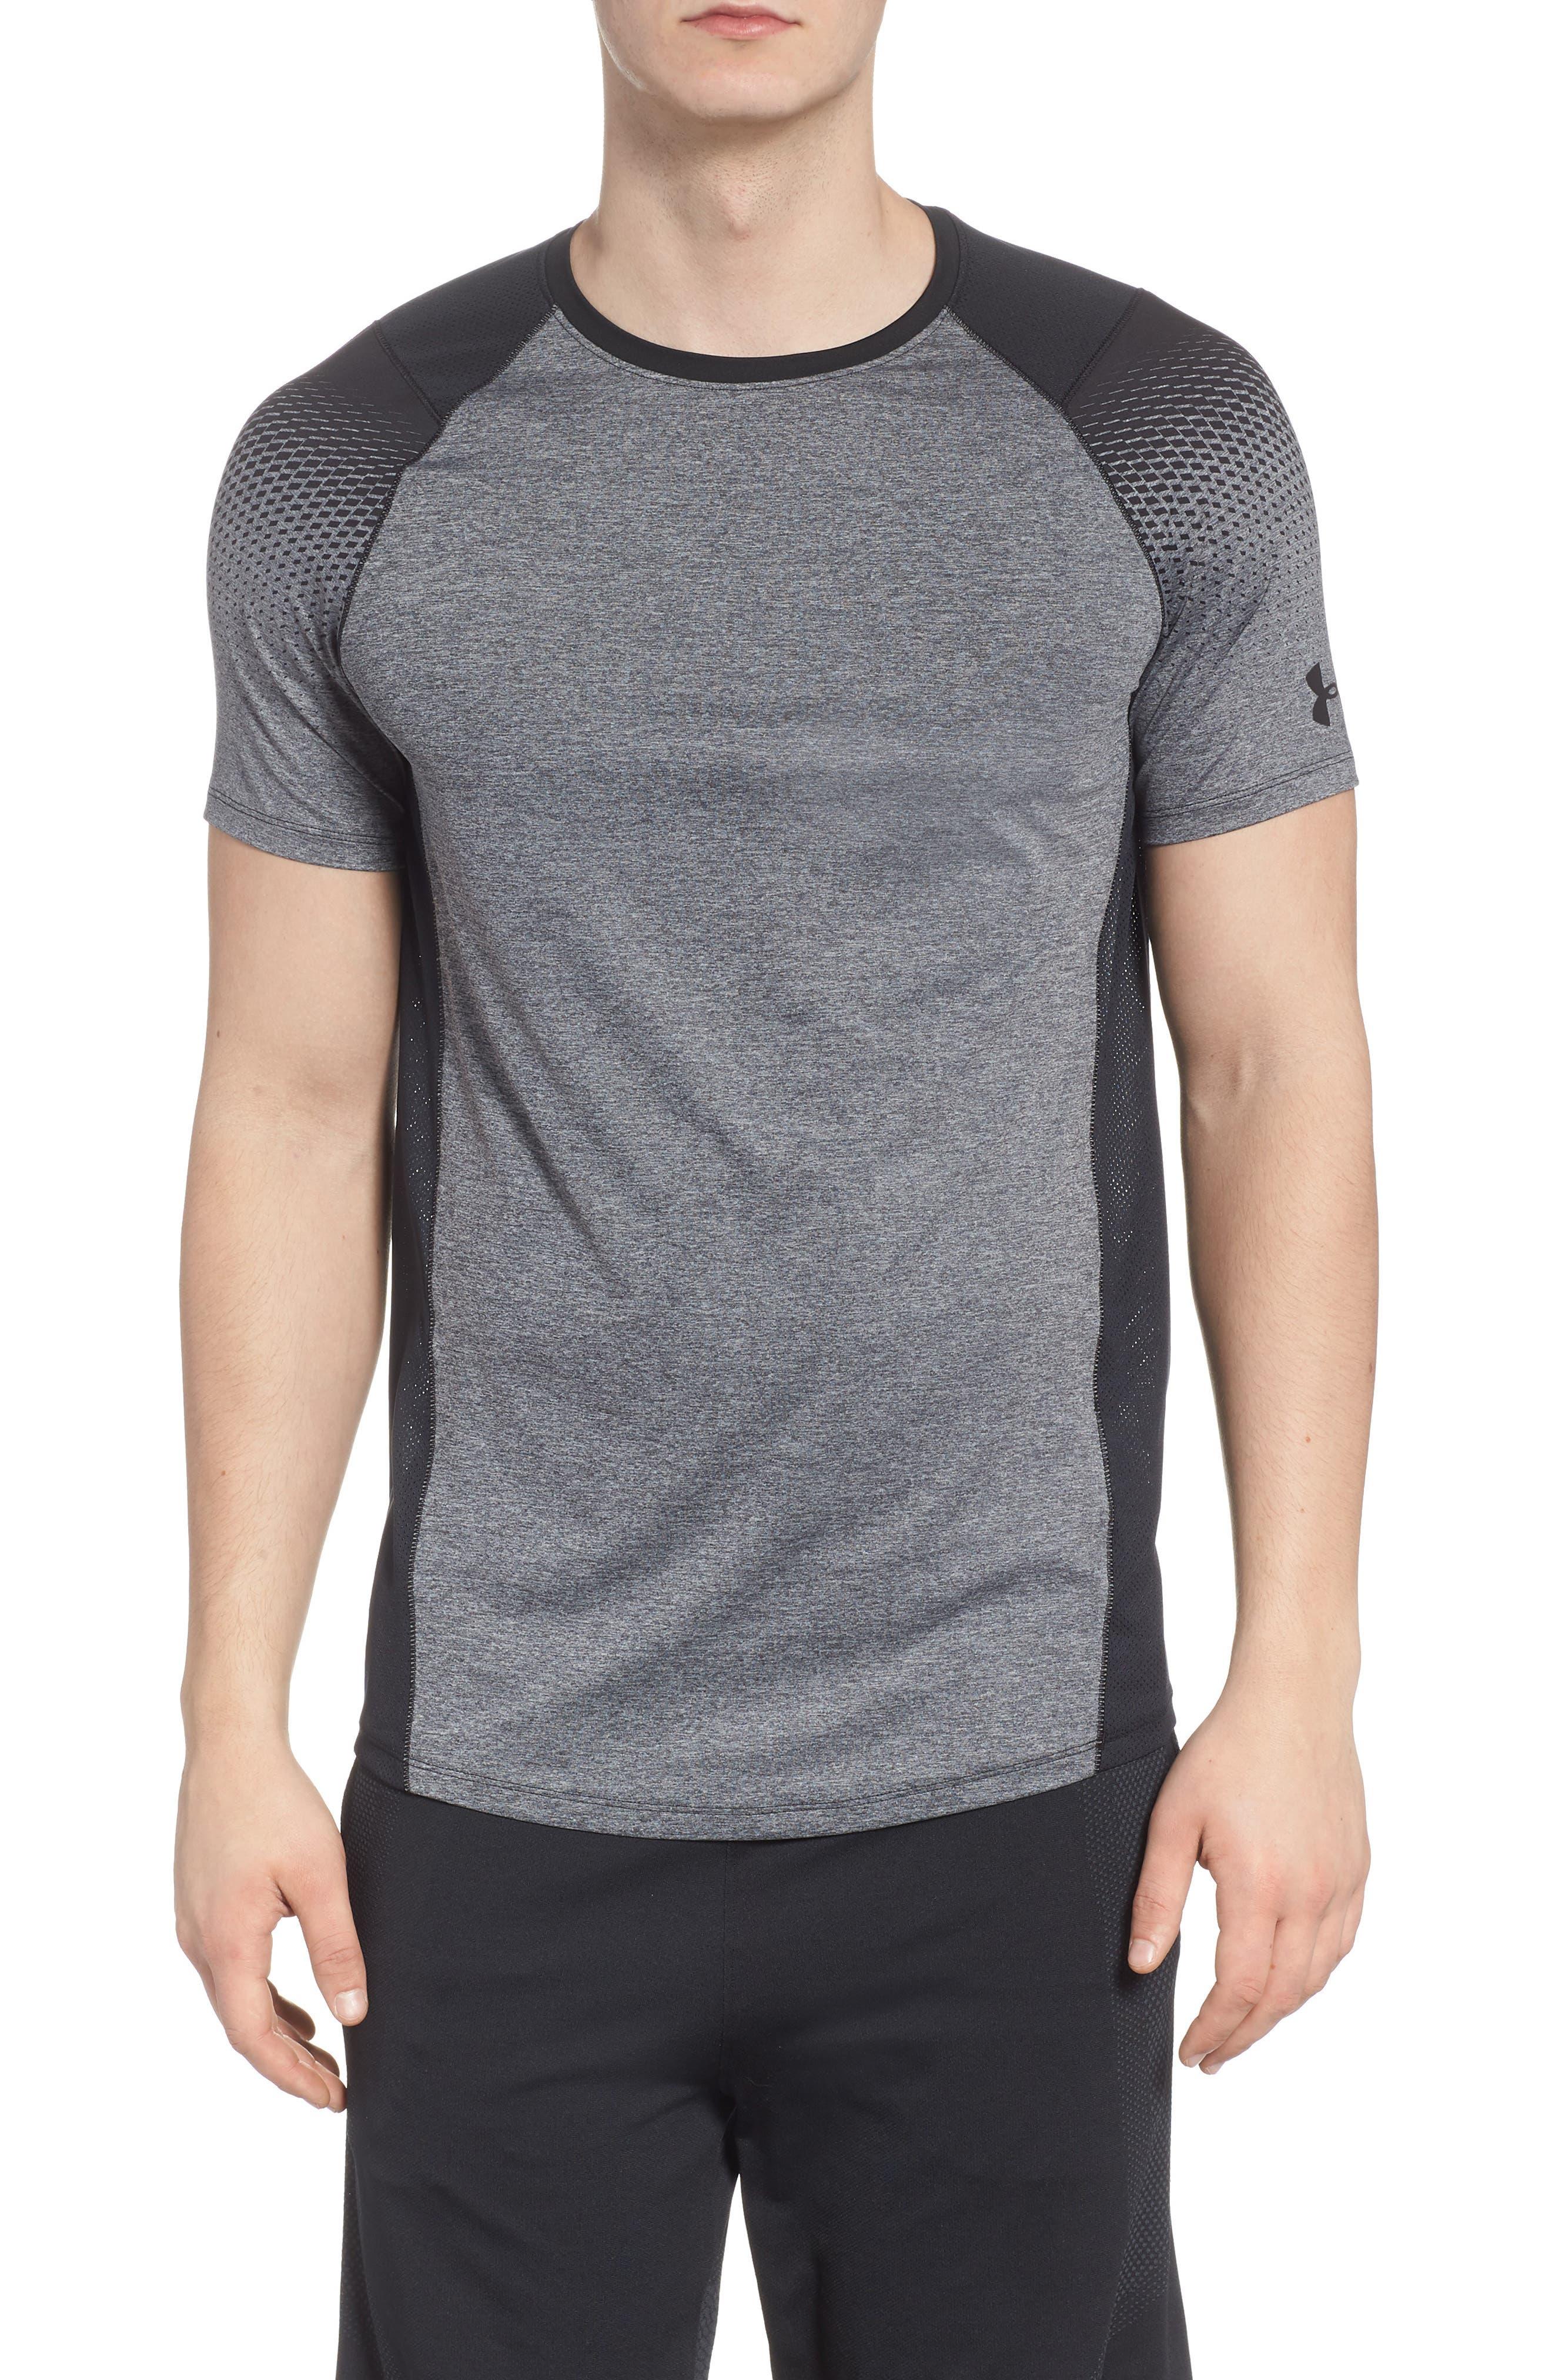 MK1 Dash Print Crewneck T-Shirt,                         Main,                         color, 001